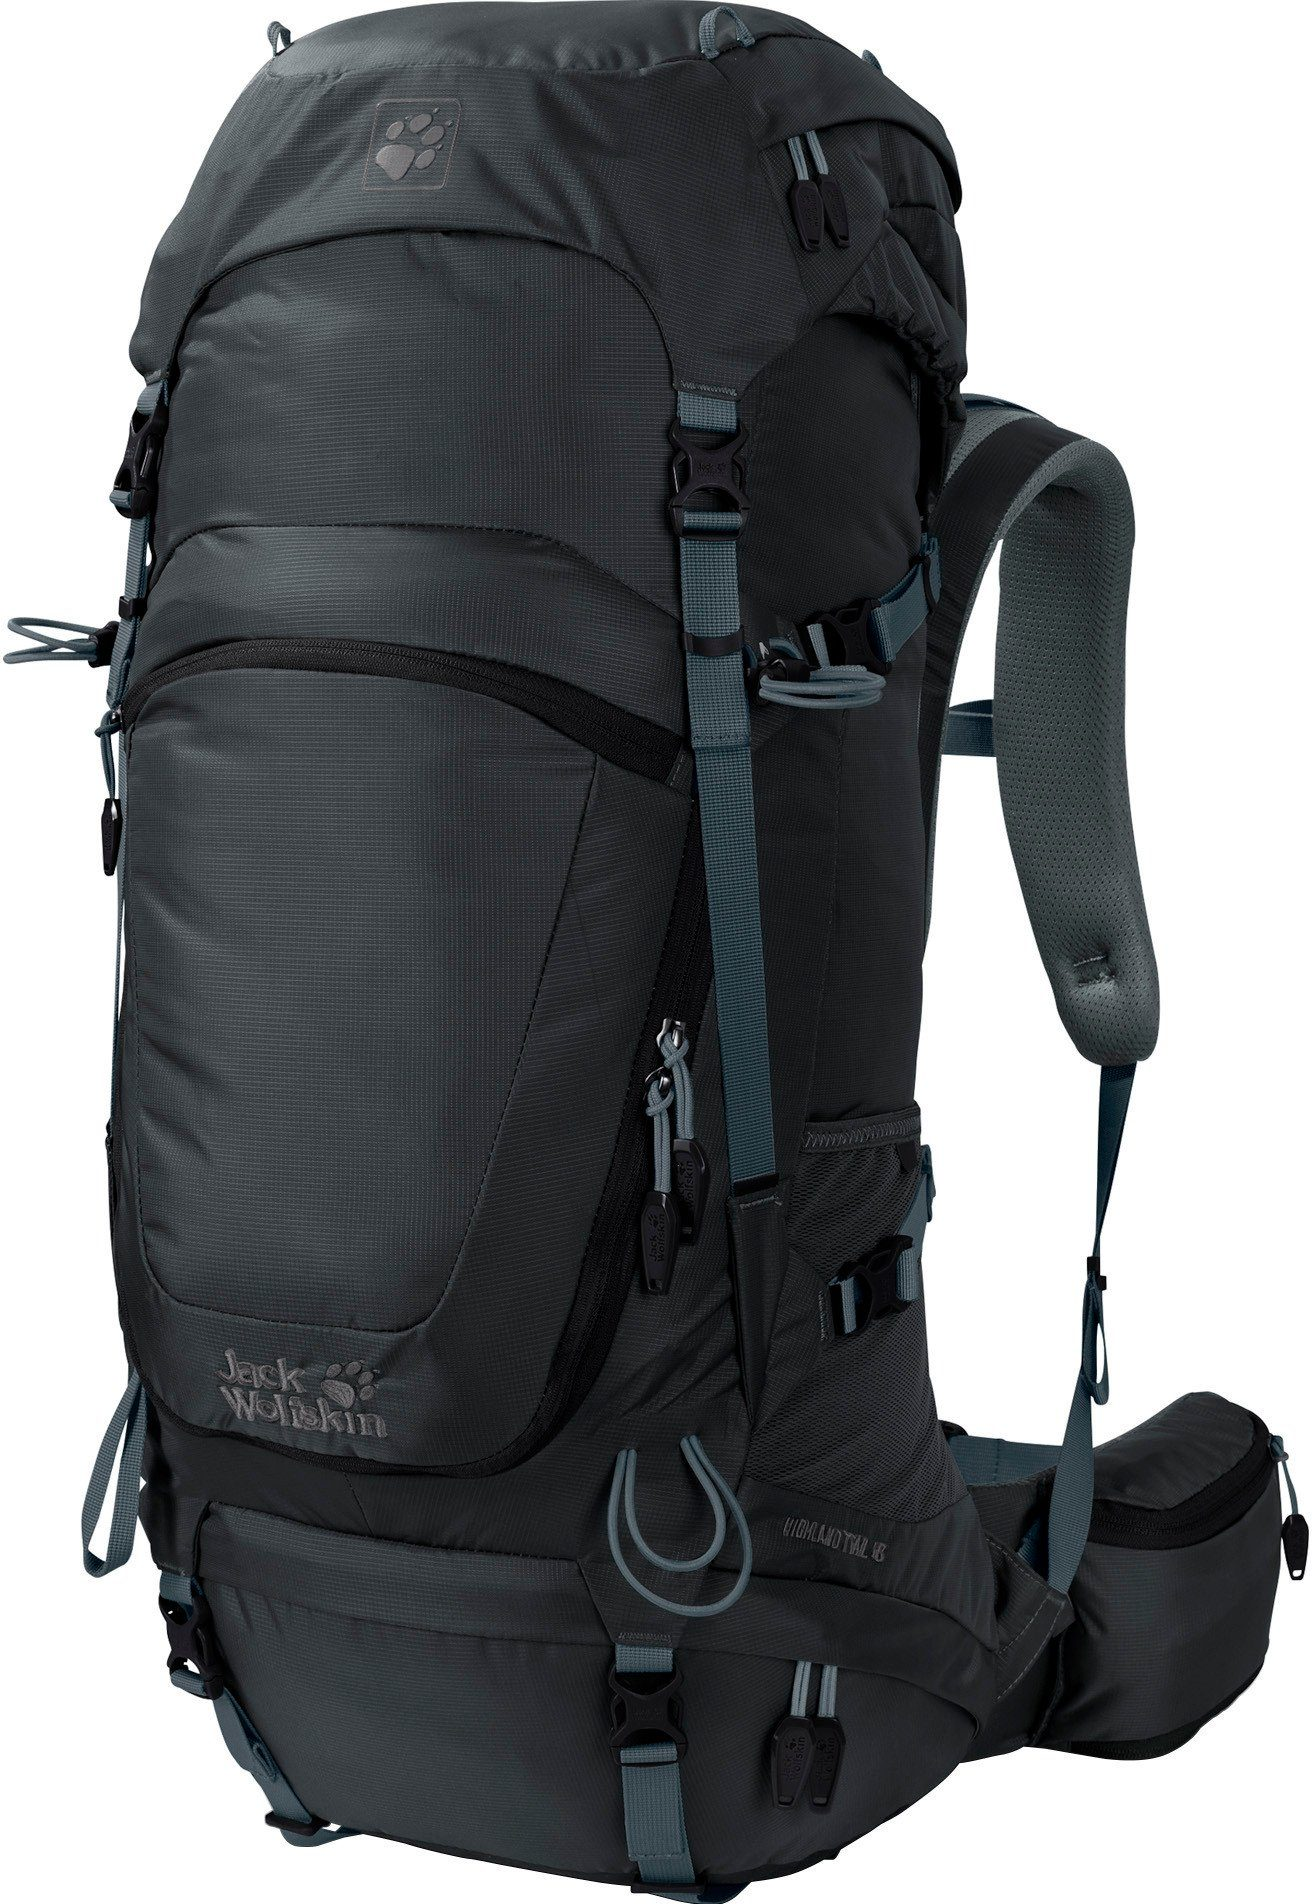 Jack Wolfskin Wanderrucksack »Highland Trail 48 Backpack«